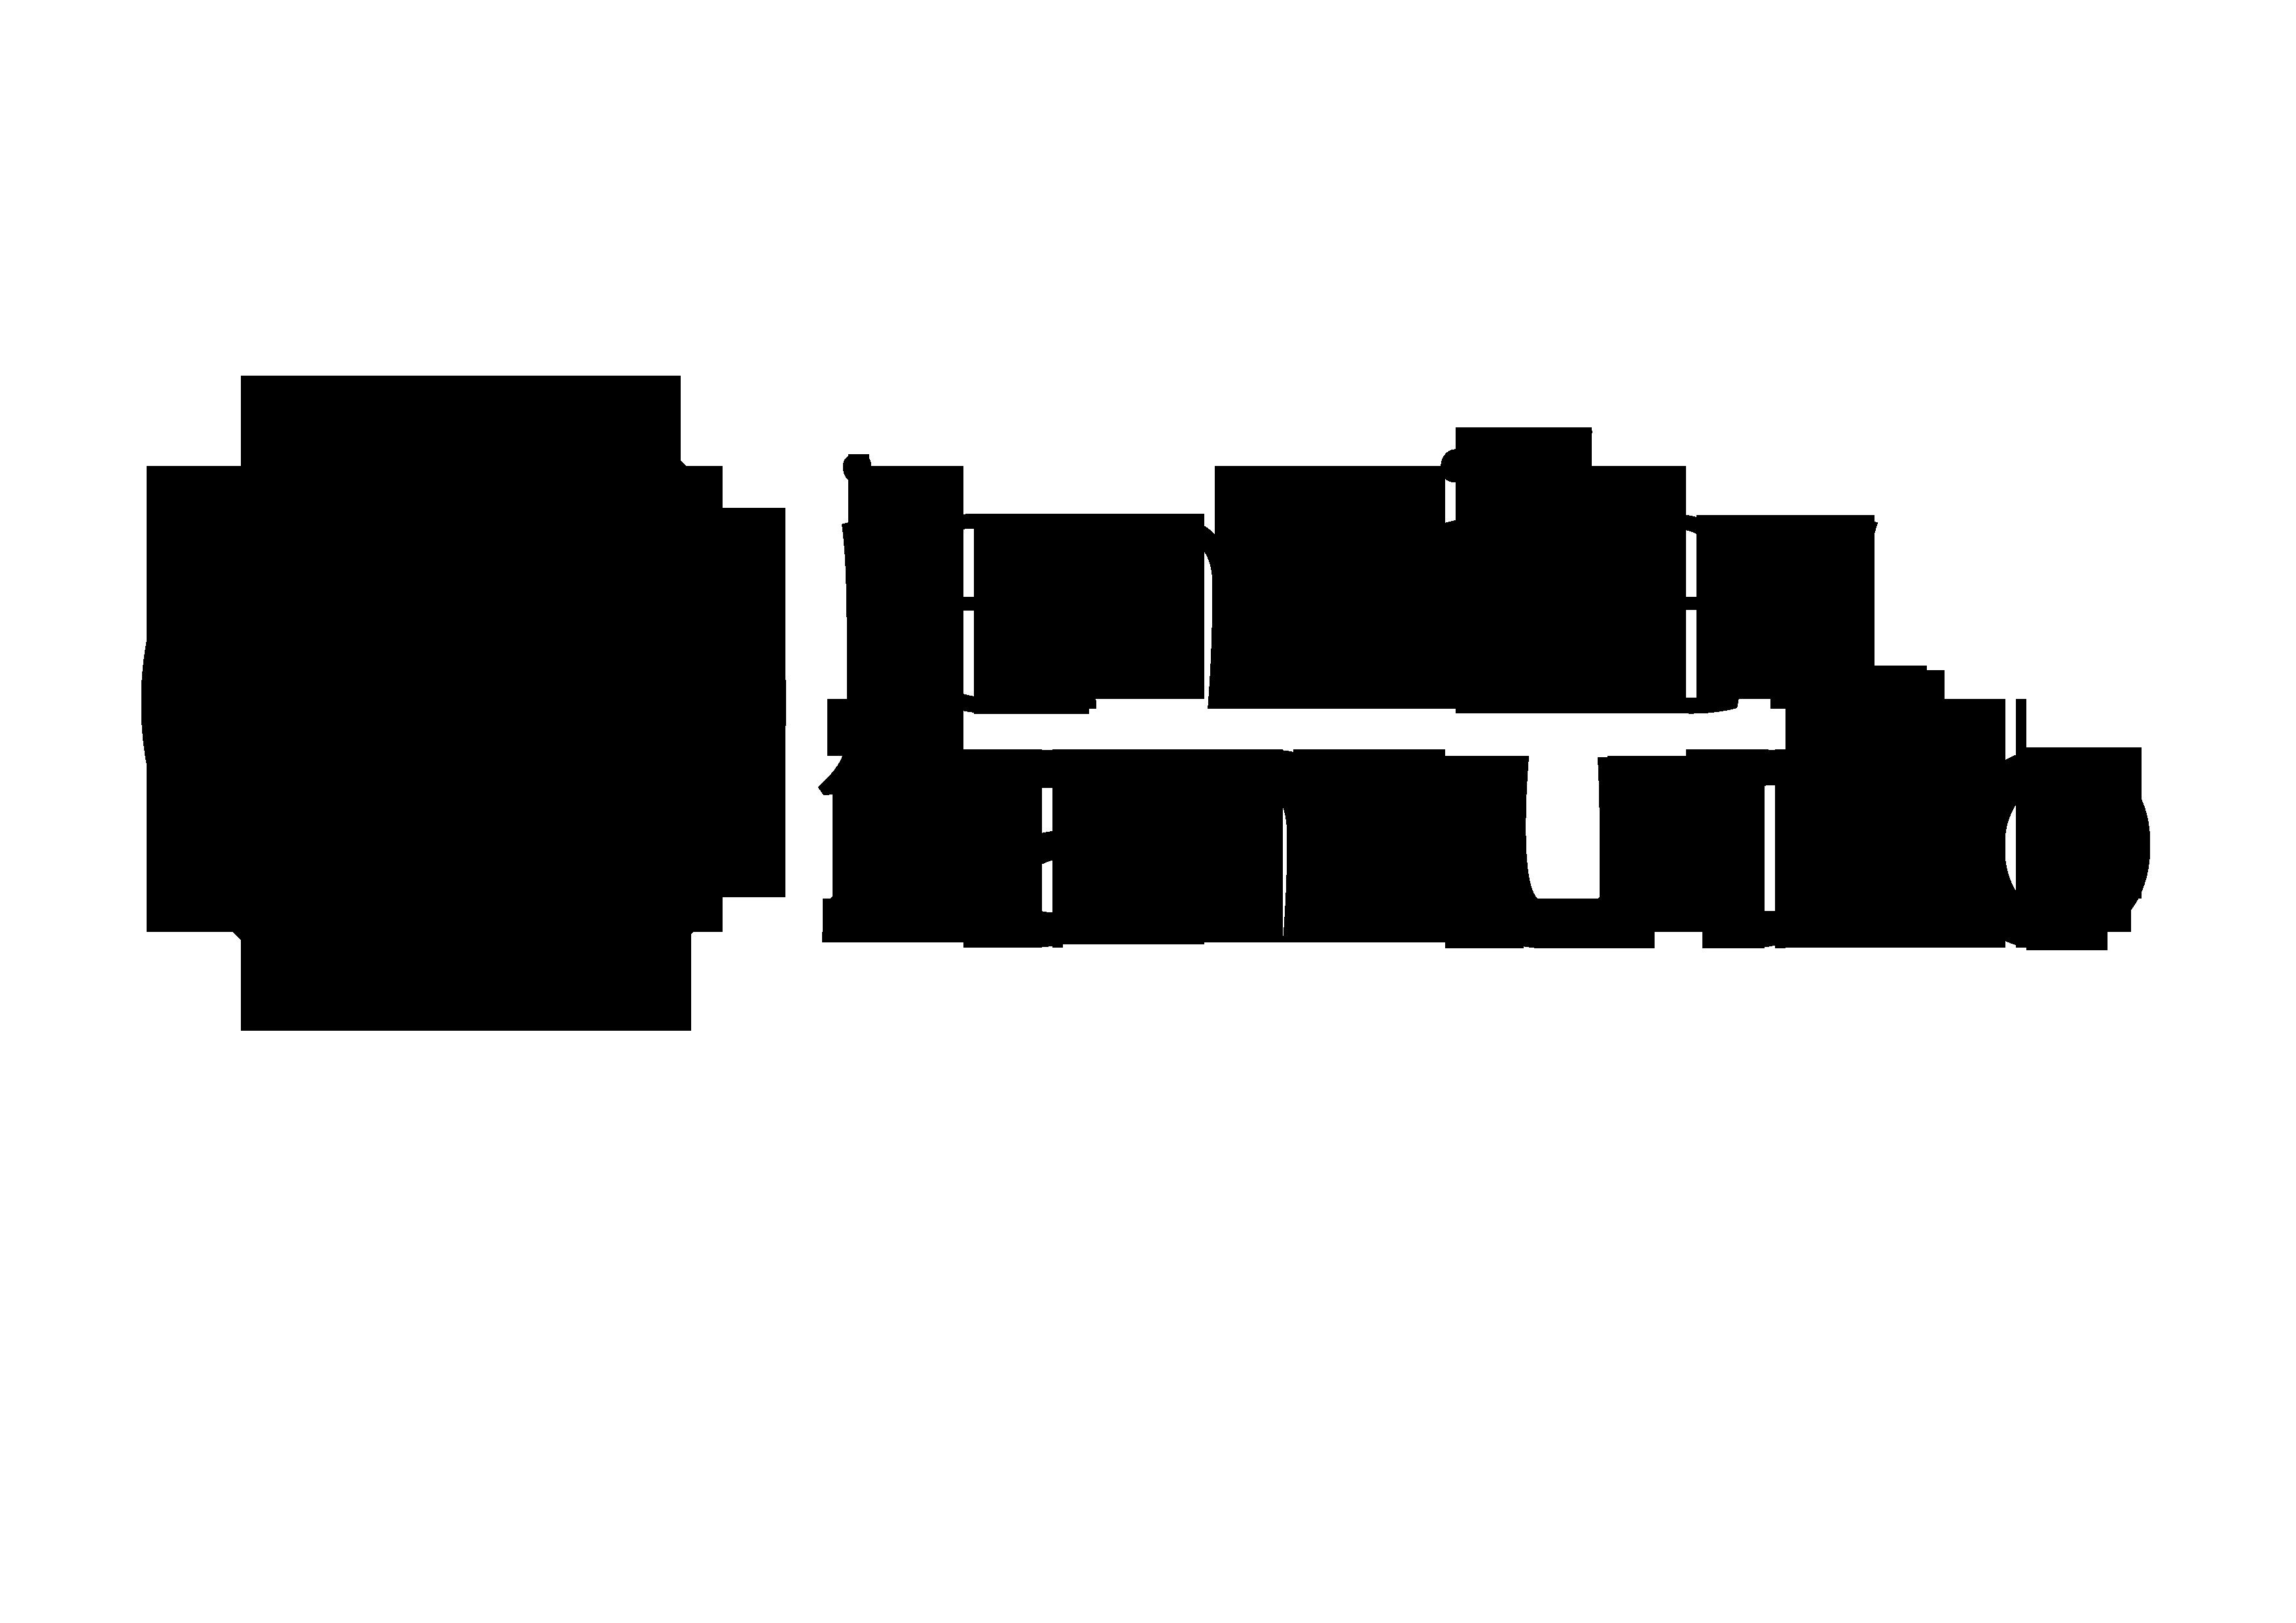 Jz branding   logo final   black transparentbg